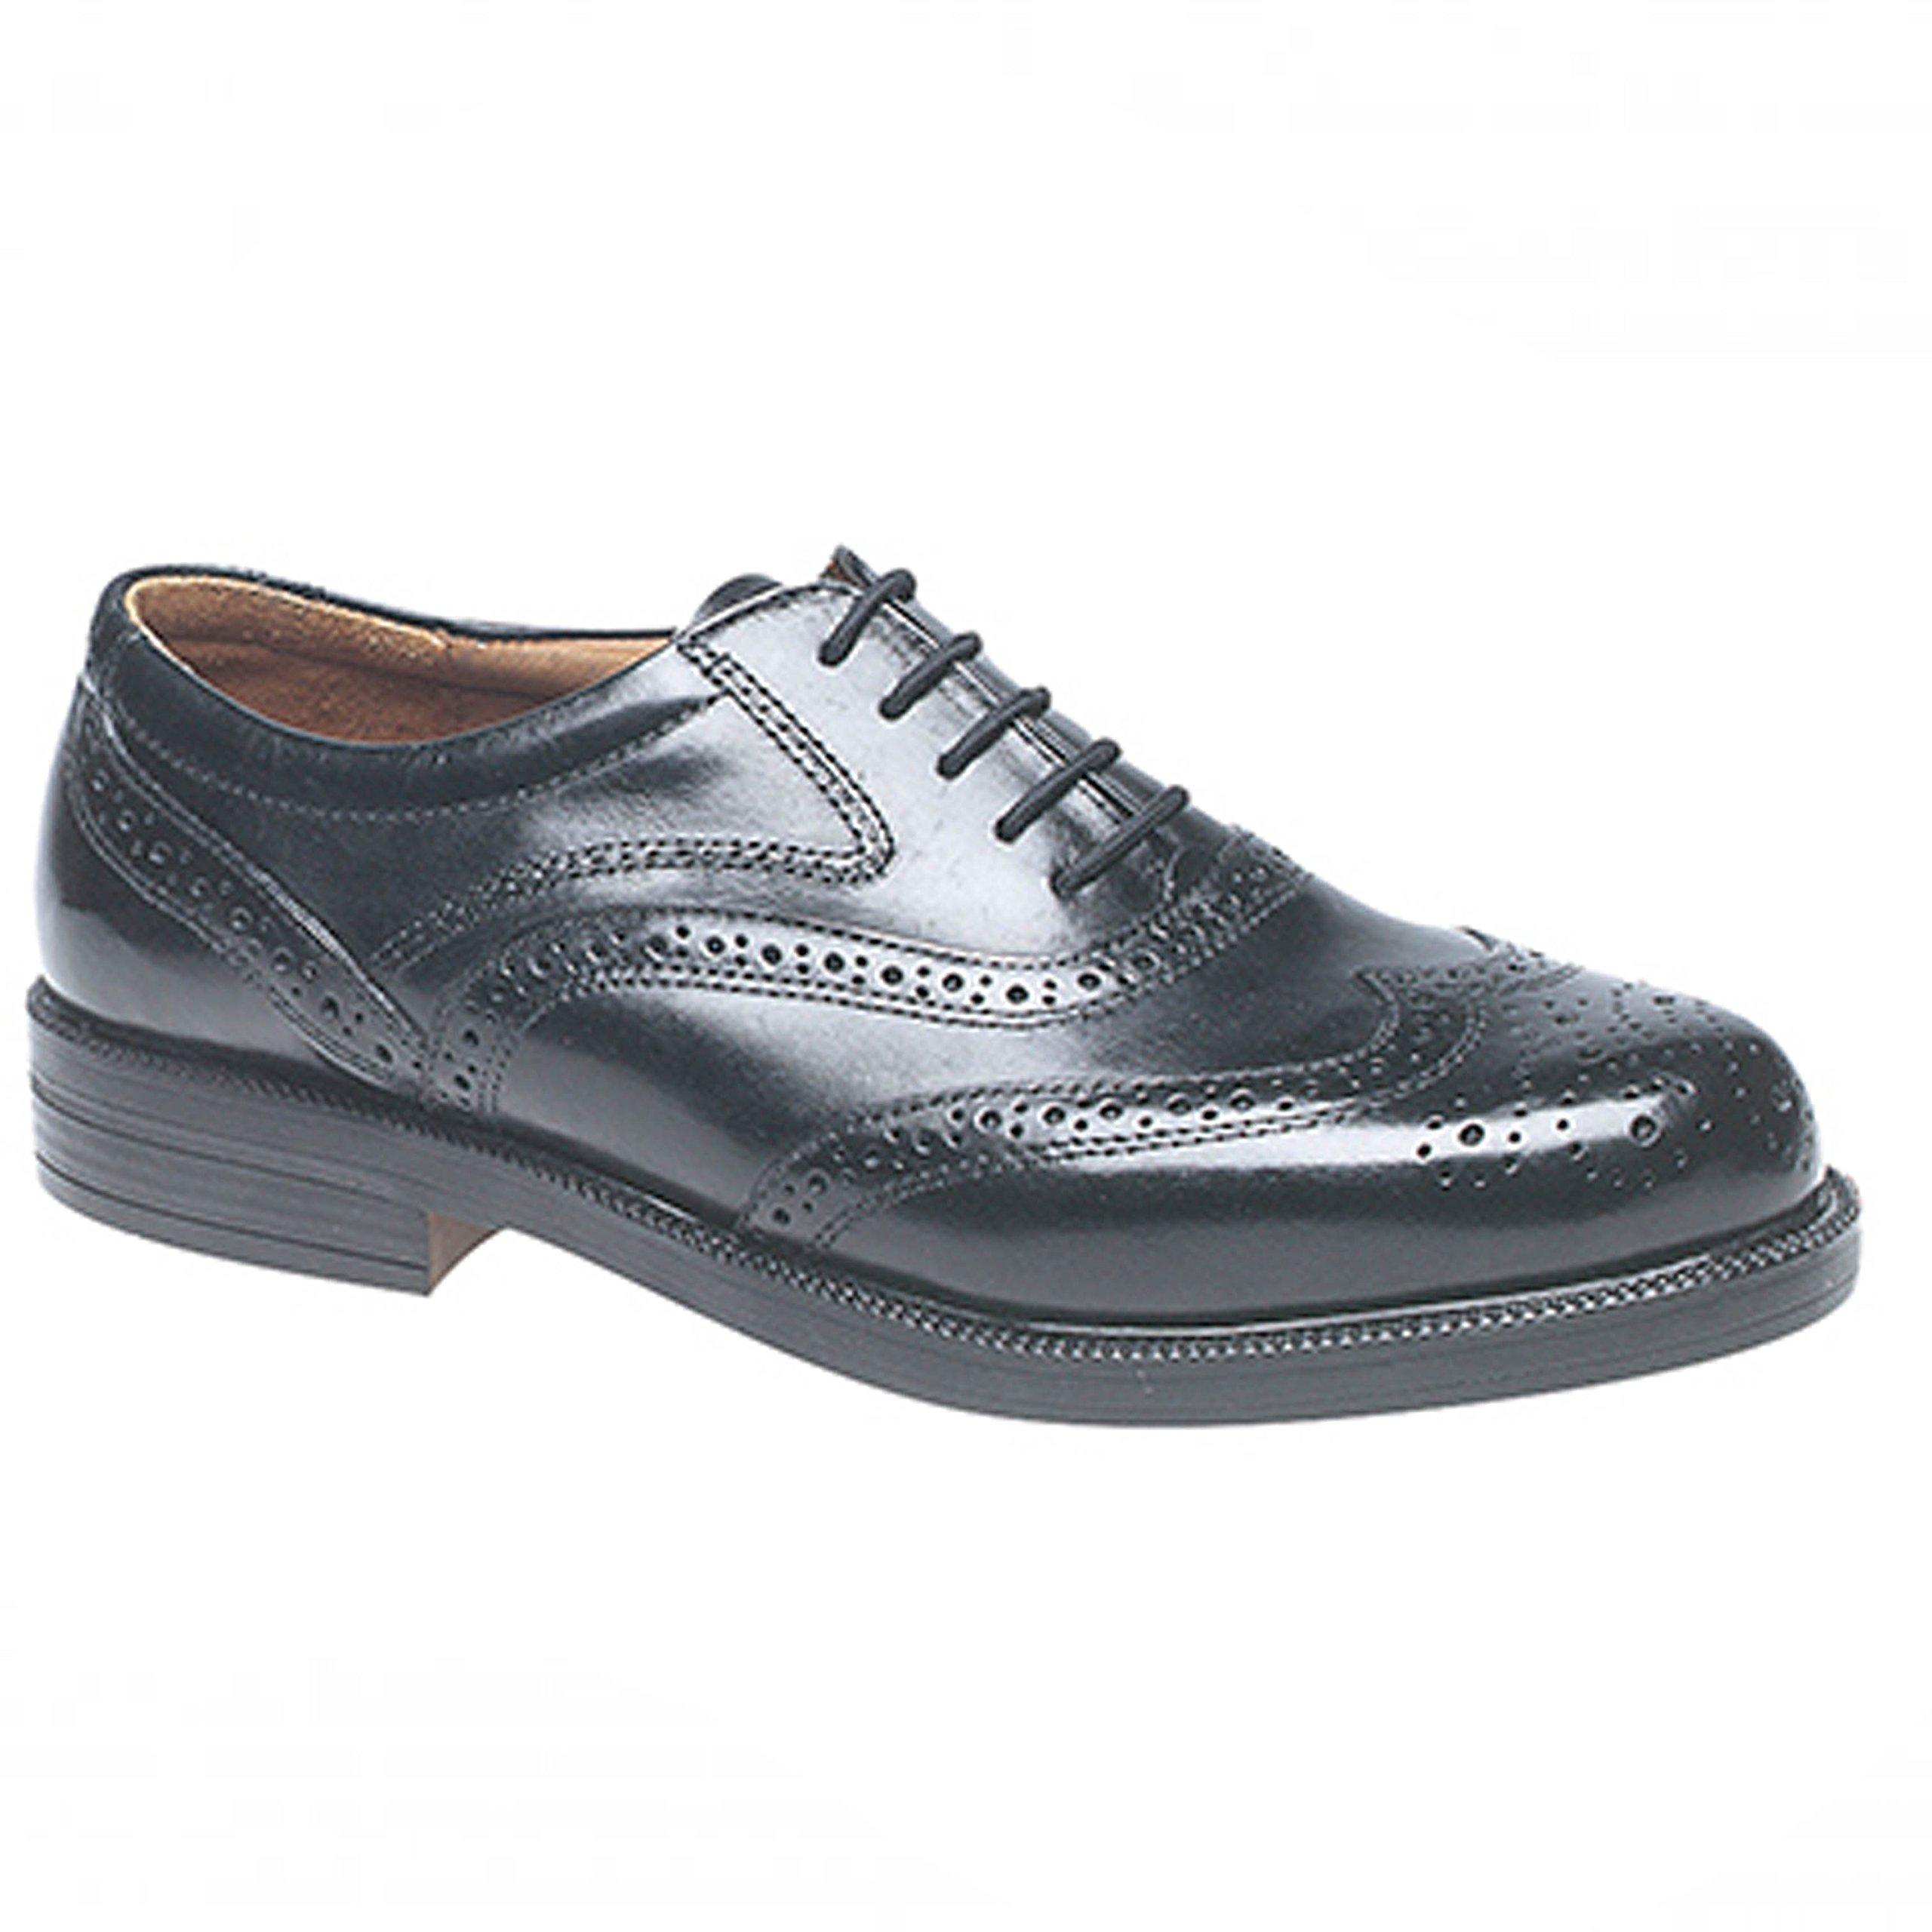 mens dress shoes size 14 wide